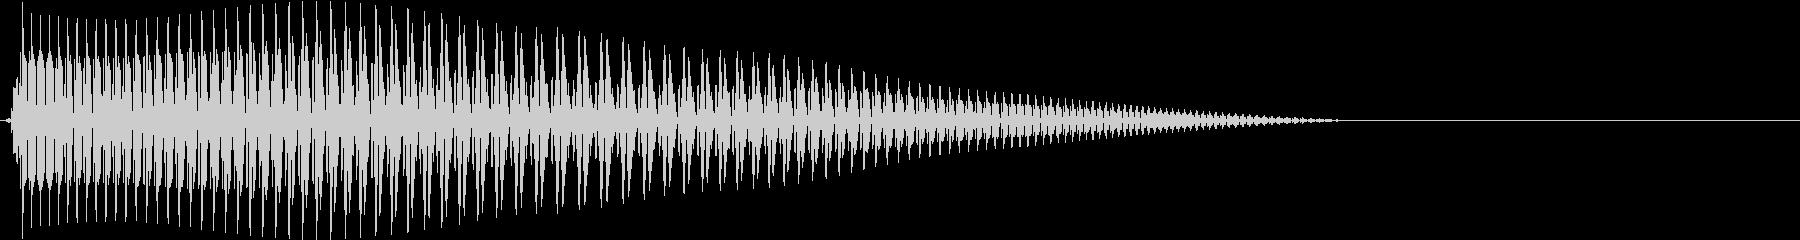 Game 横スクロール系ゲーム 効果音3の未再生の波形